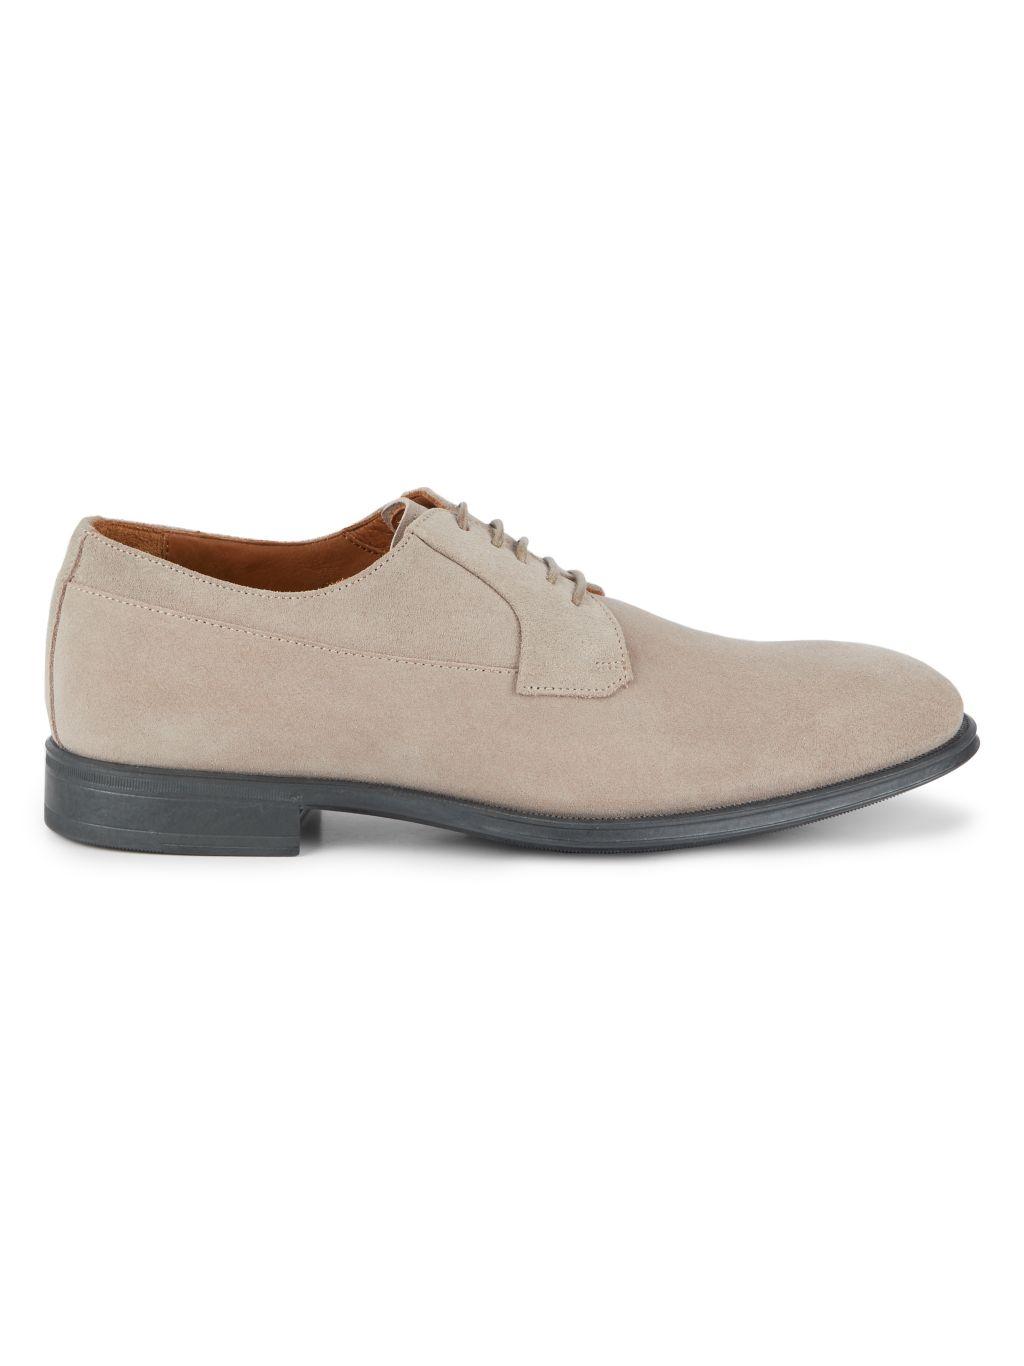 Aquatalia Decker Suede Derby Shoes